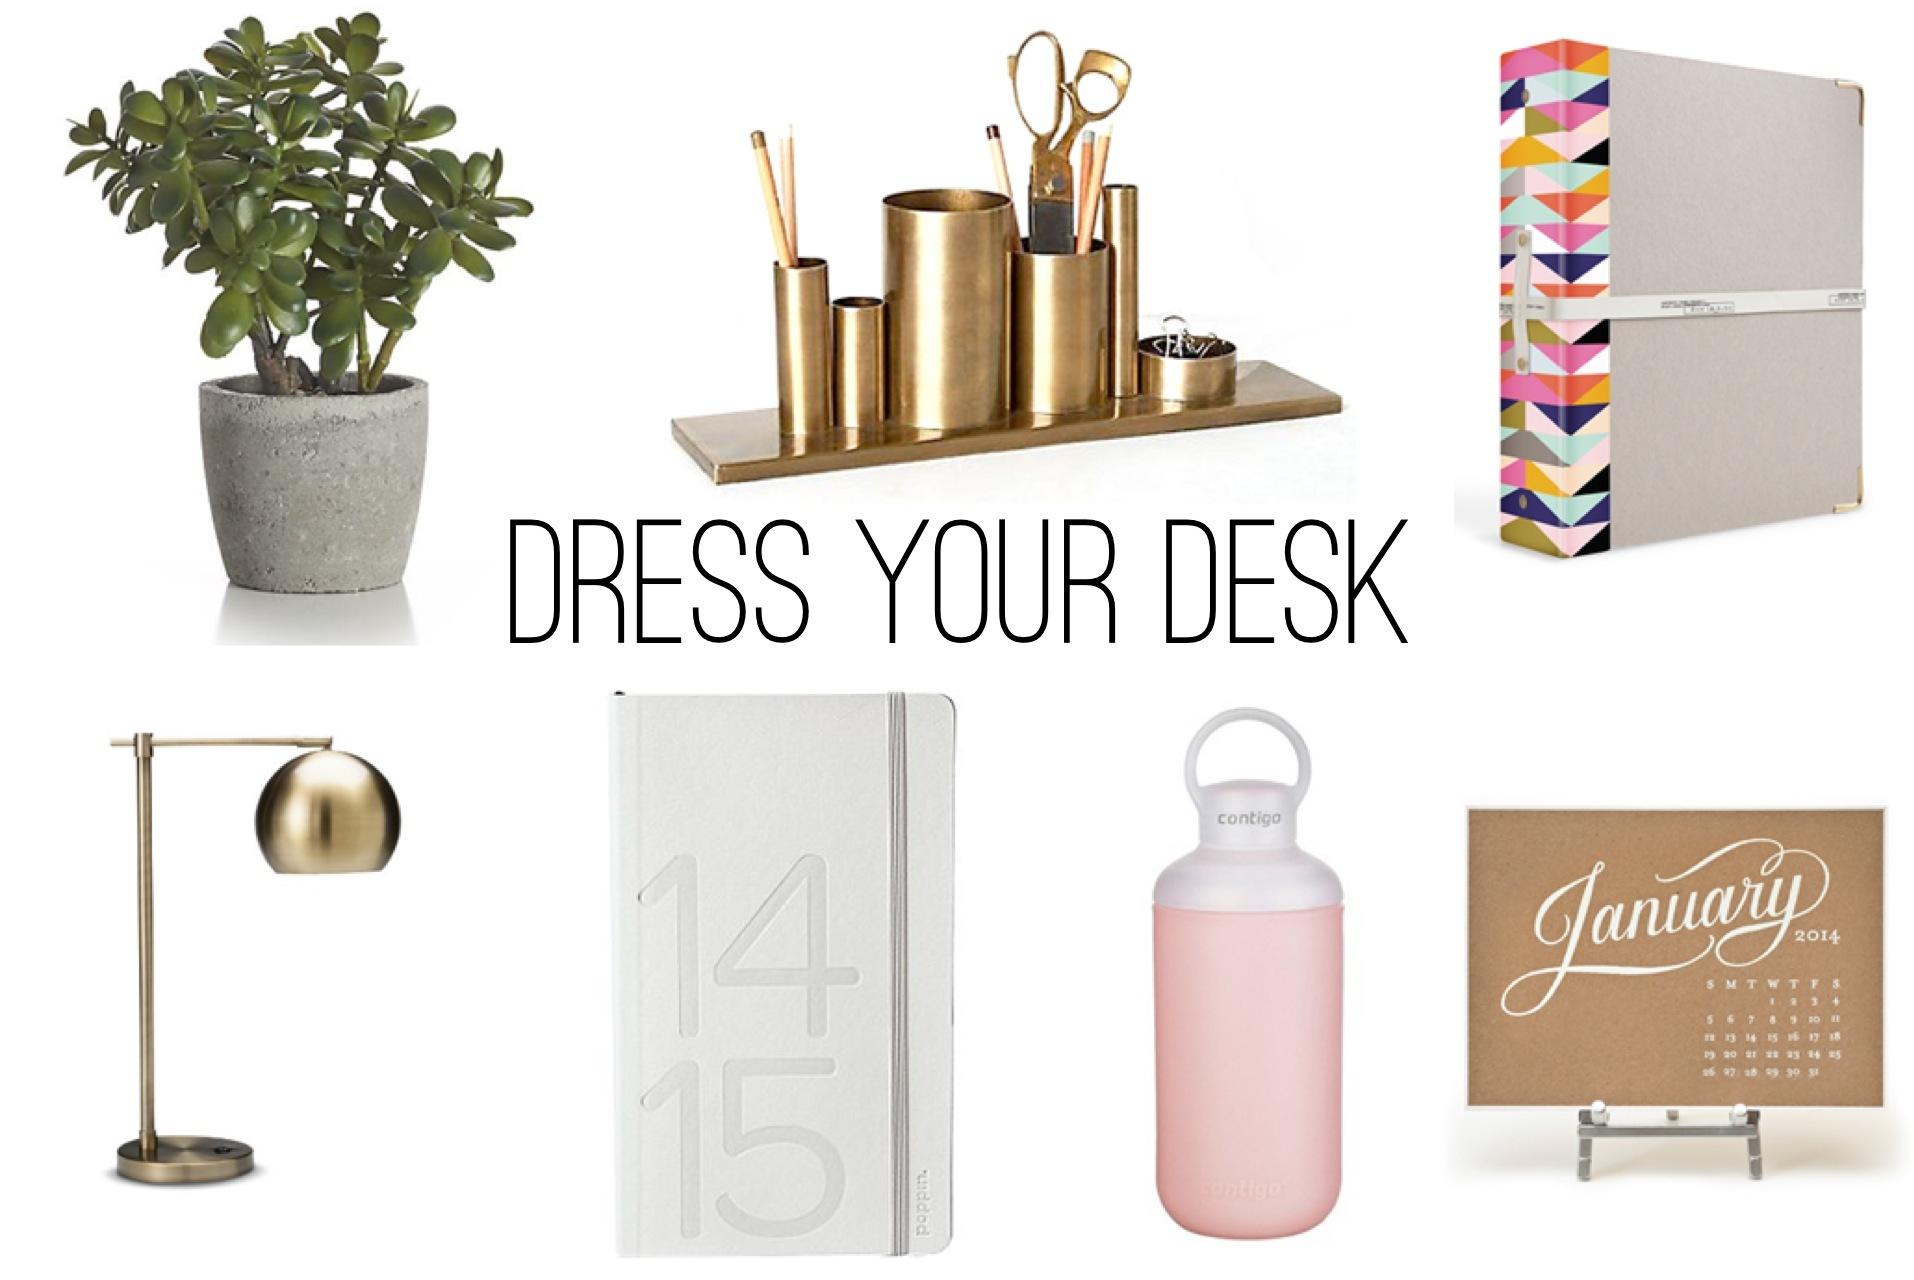 Dress Your Desk